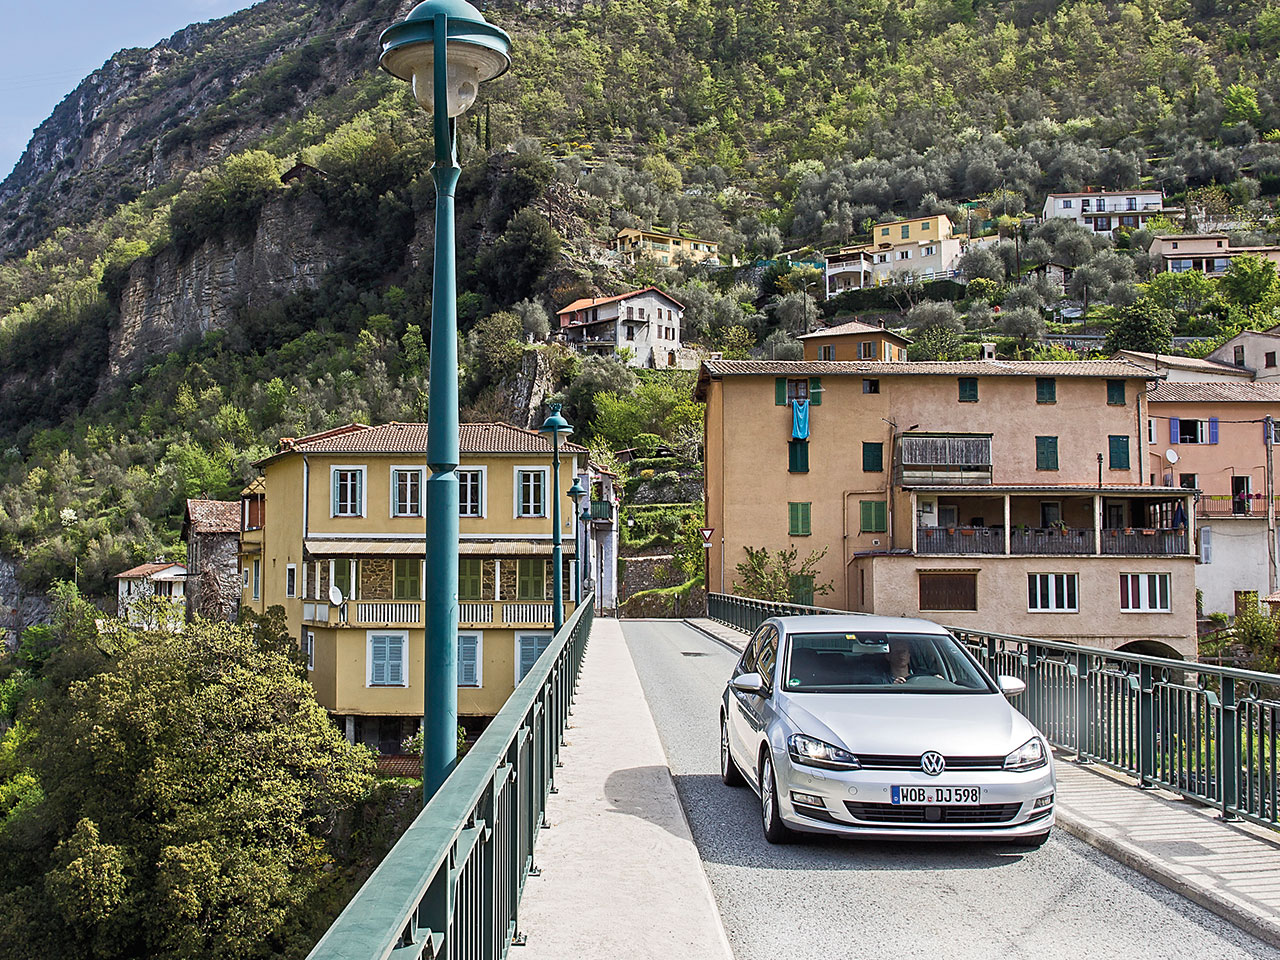 VW Golf 7 2 0 TDI Dauertest